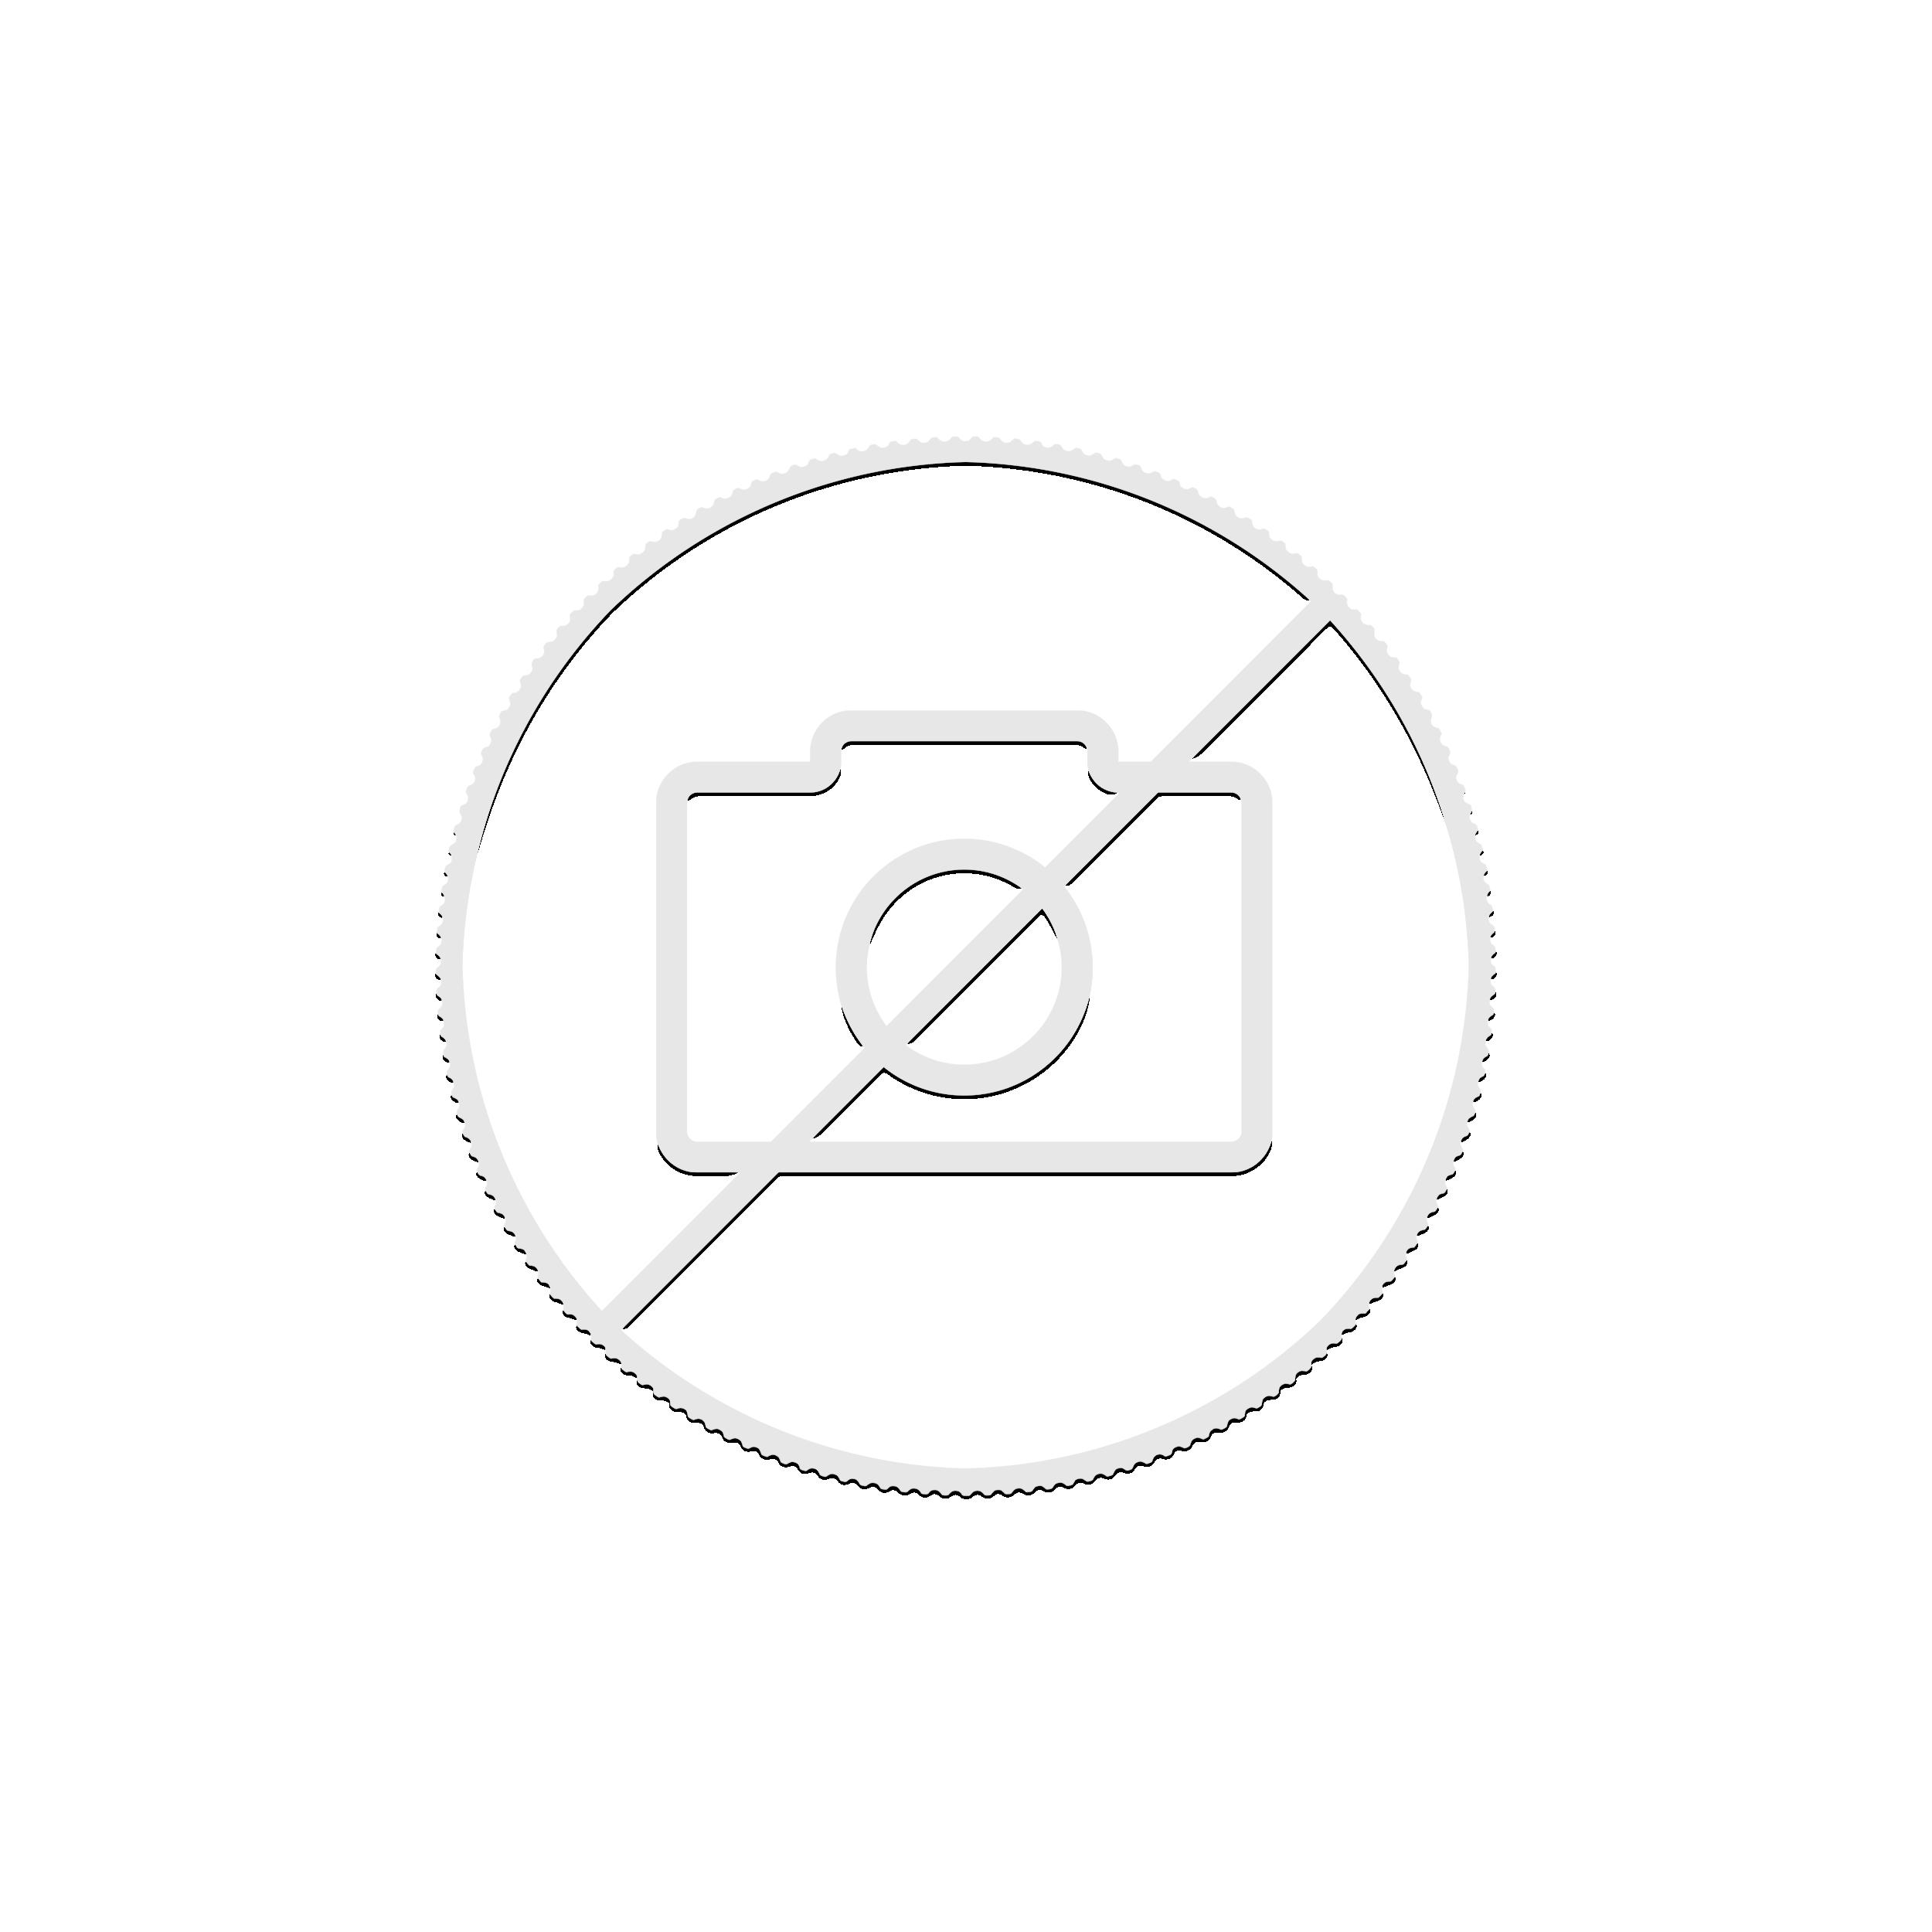 8 Gram gouden Panda munt 2018